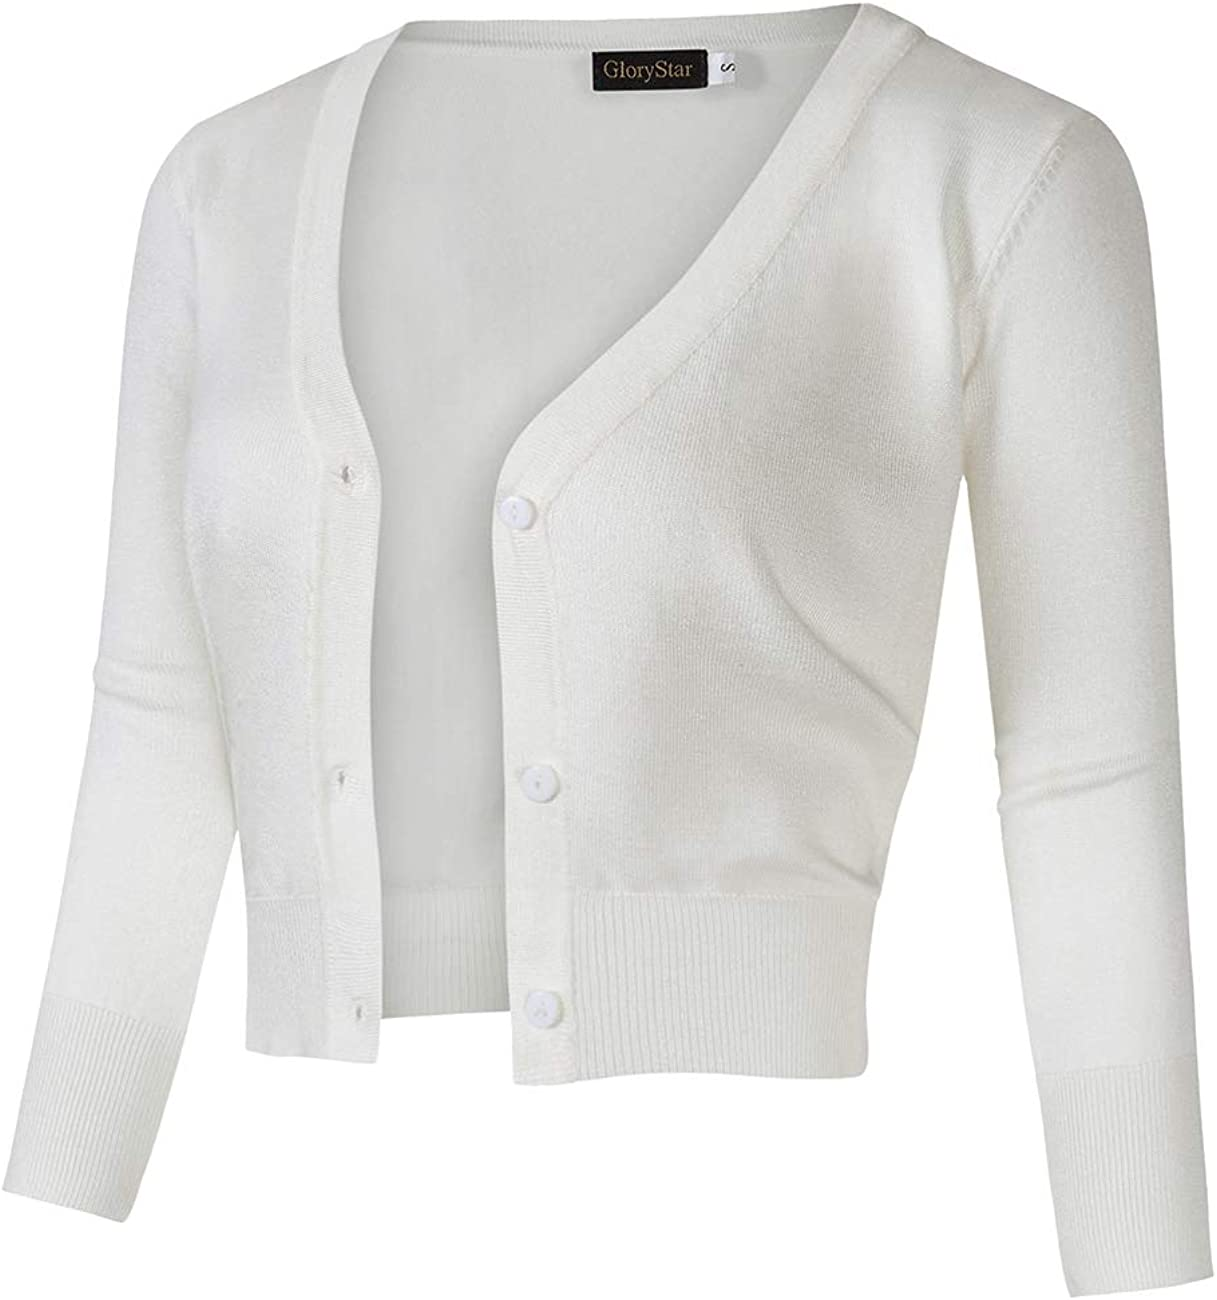 GloryStar Women's Casual Open Front Knit Cropped Bolero Shrug 3/4 Sleeve Cardigan Sweater